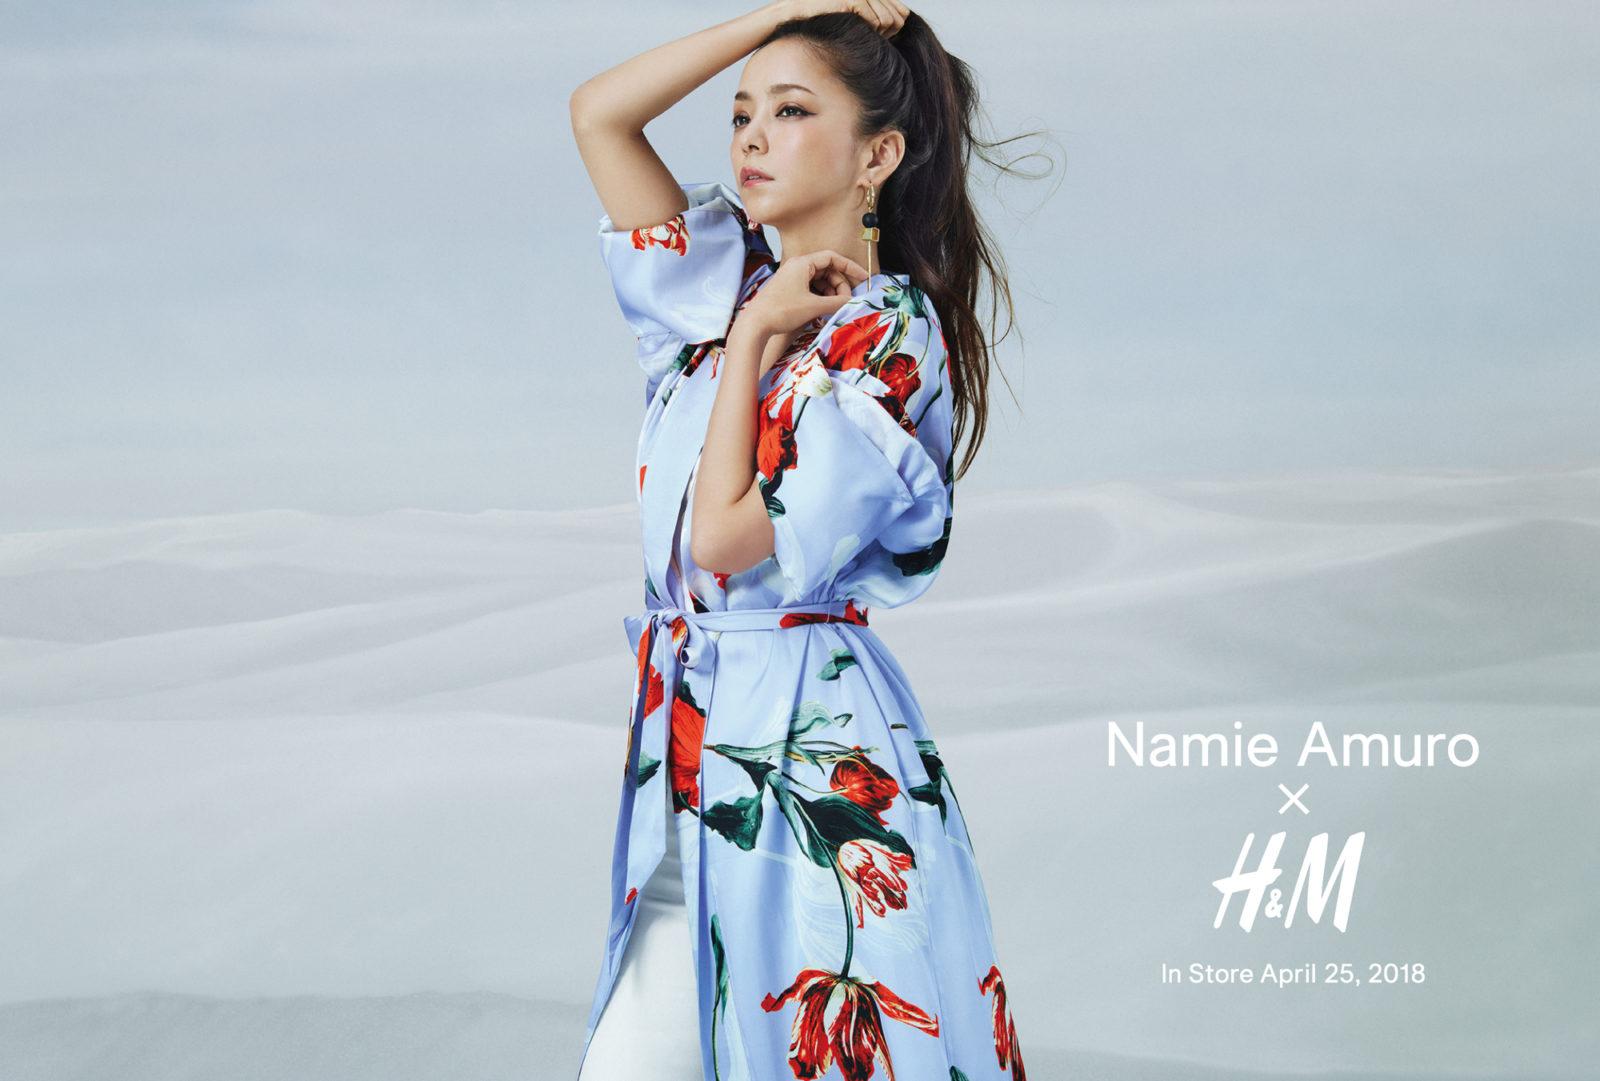 H&M、安室奈美恵とのスペシャルコラボ解禁!日本発、アジア展開へサムネイル画像